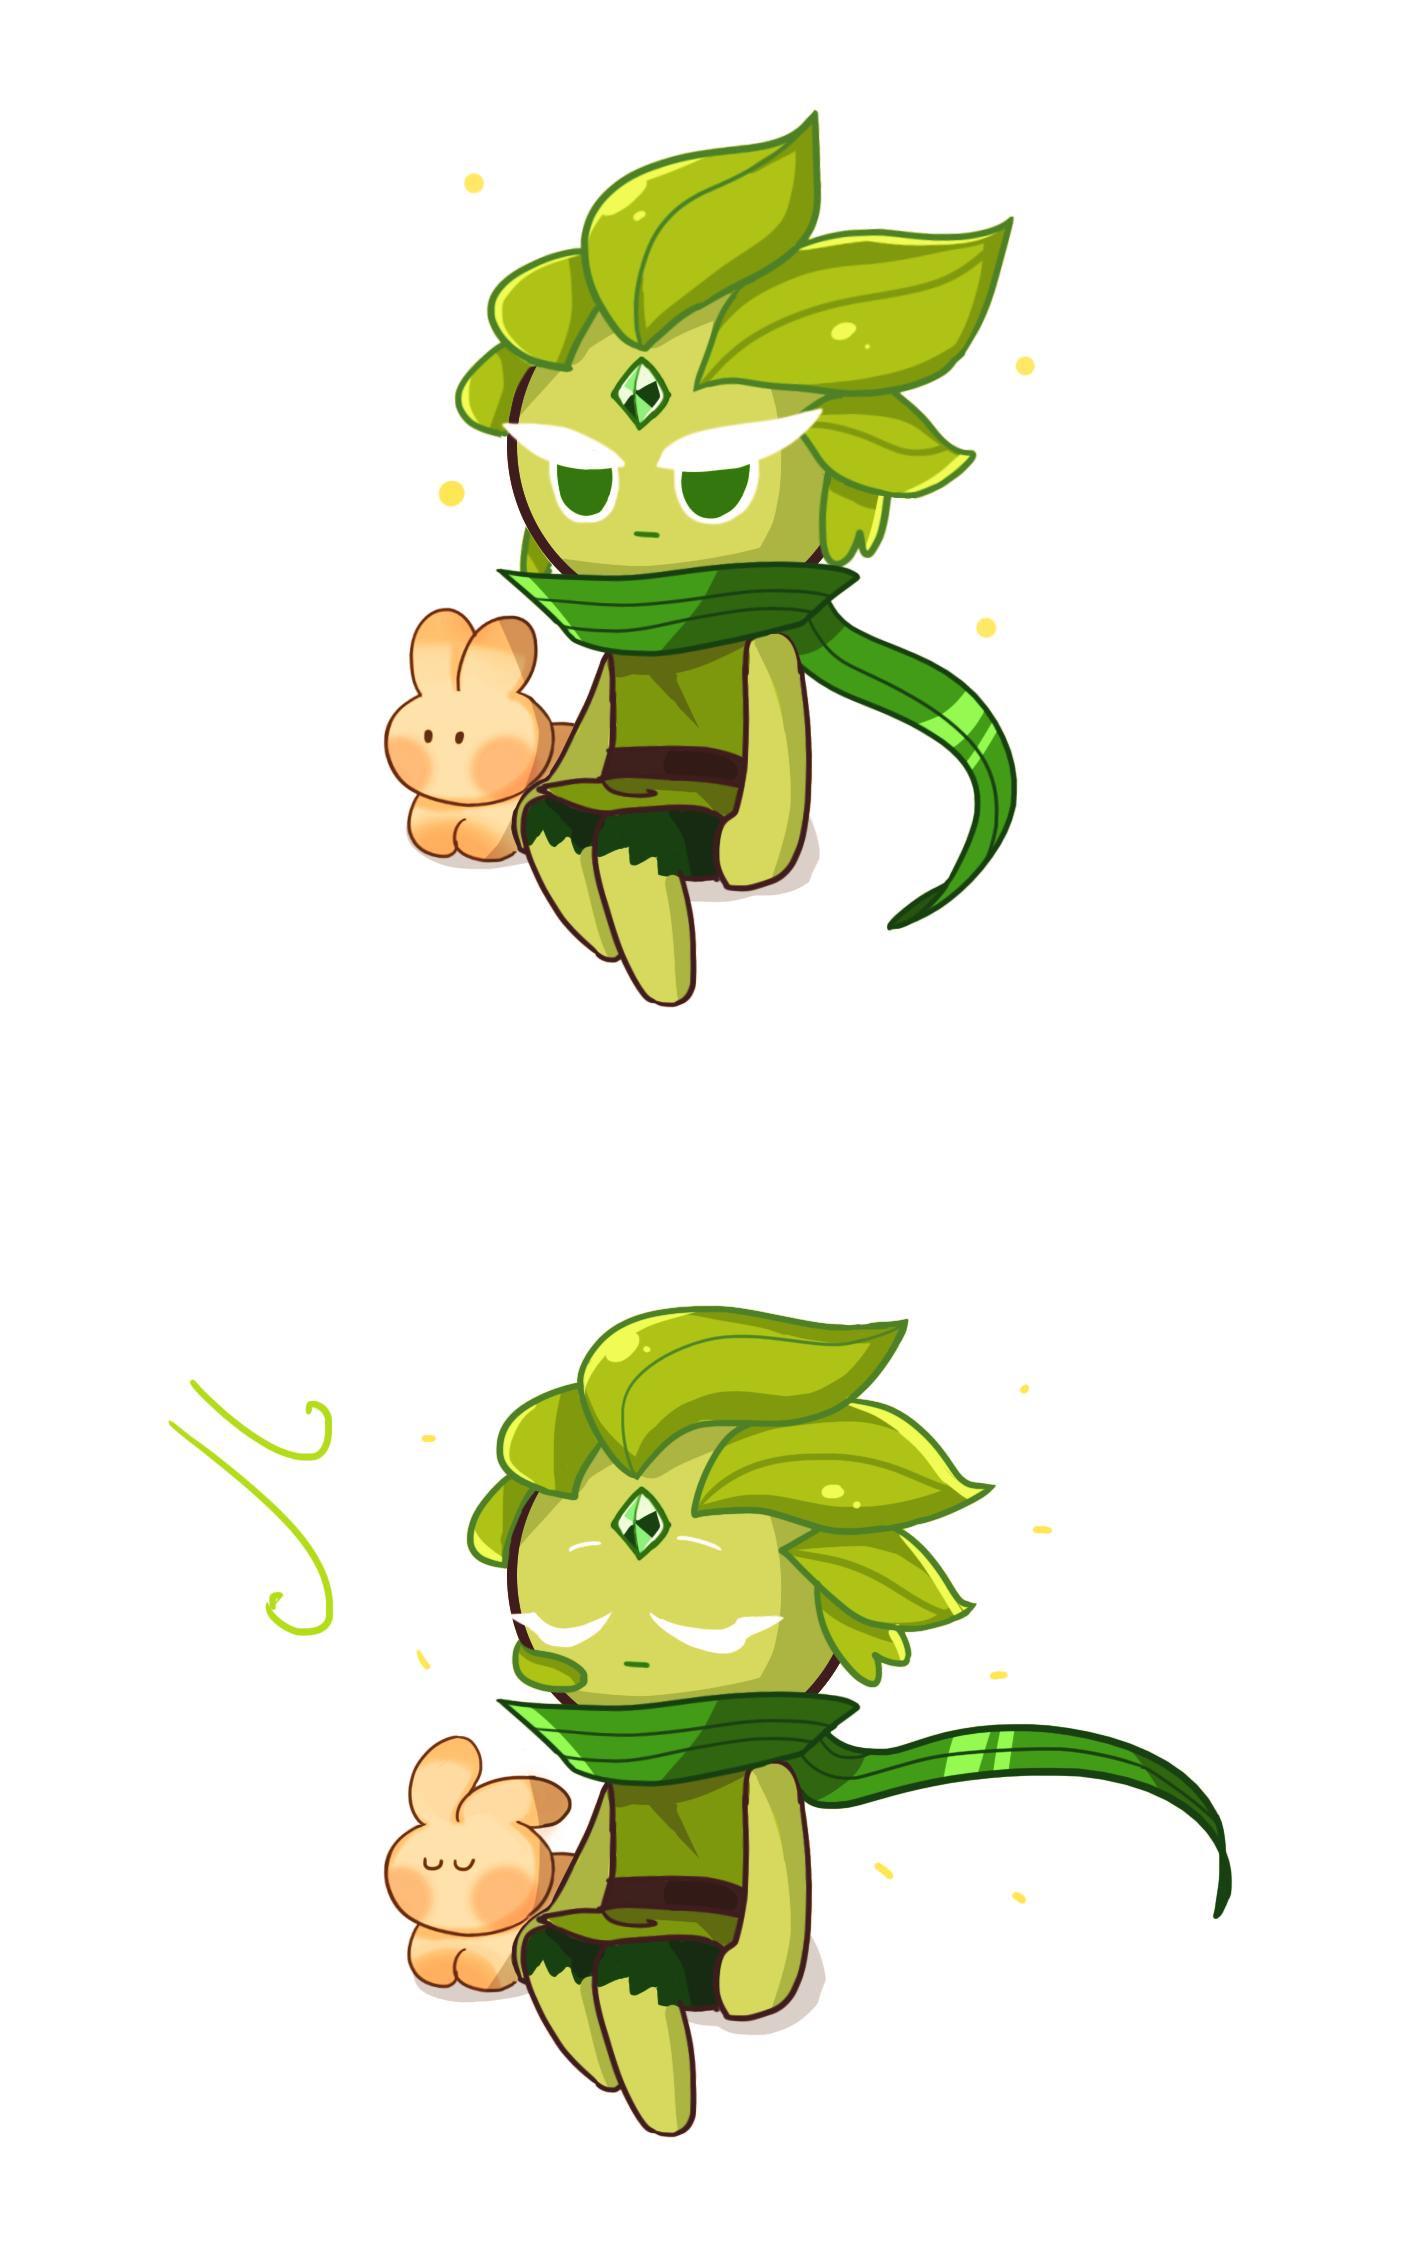 Wind Archer Cookie Cookie Run Image 2676740 Zerochan Anime